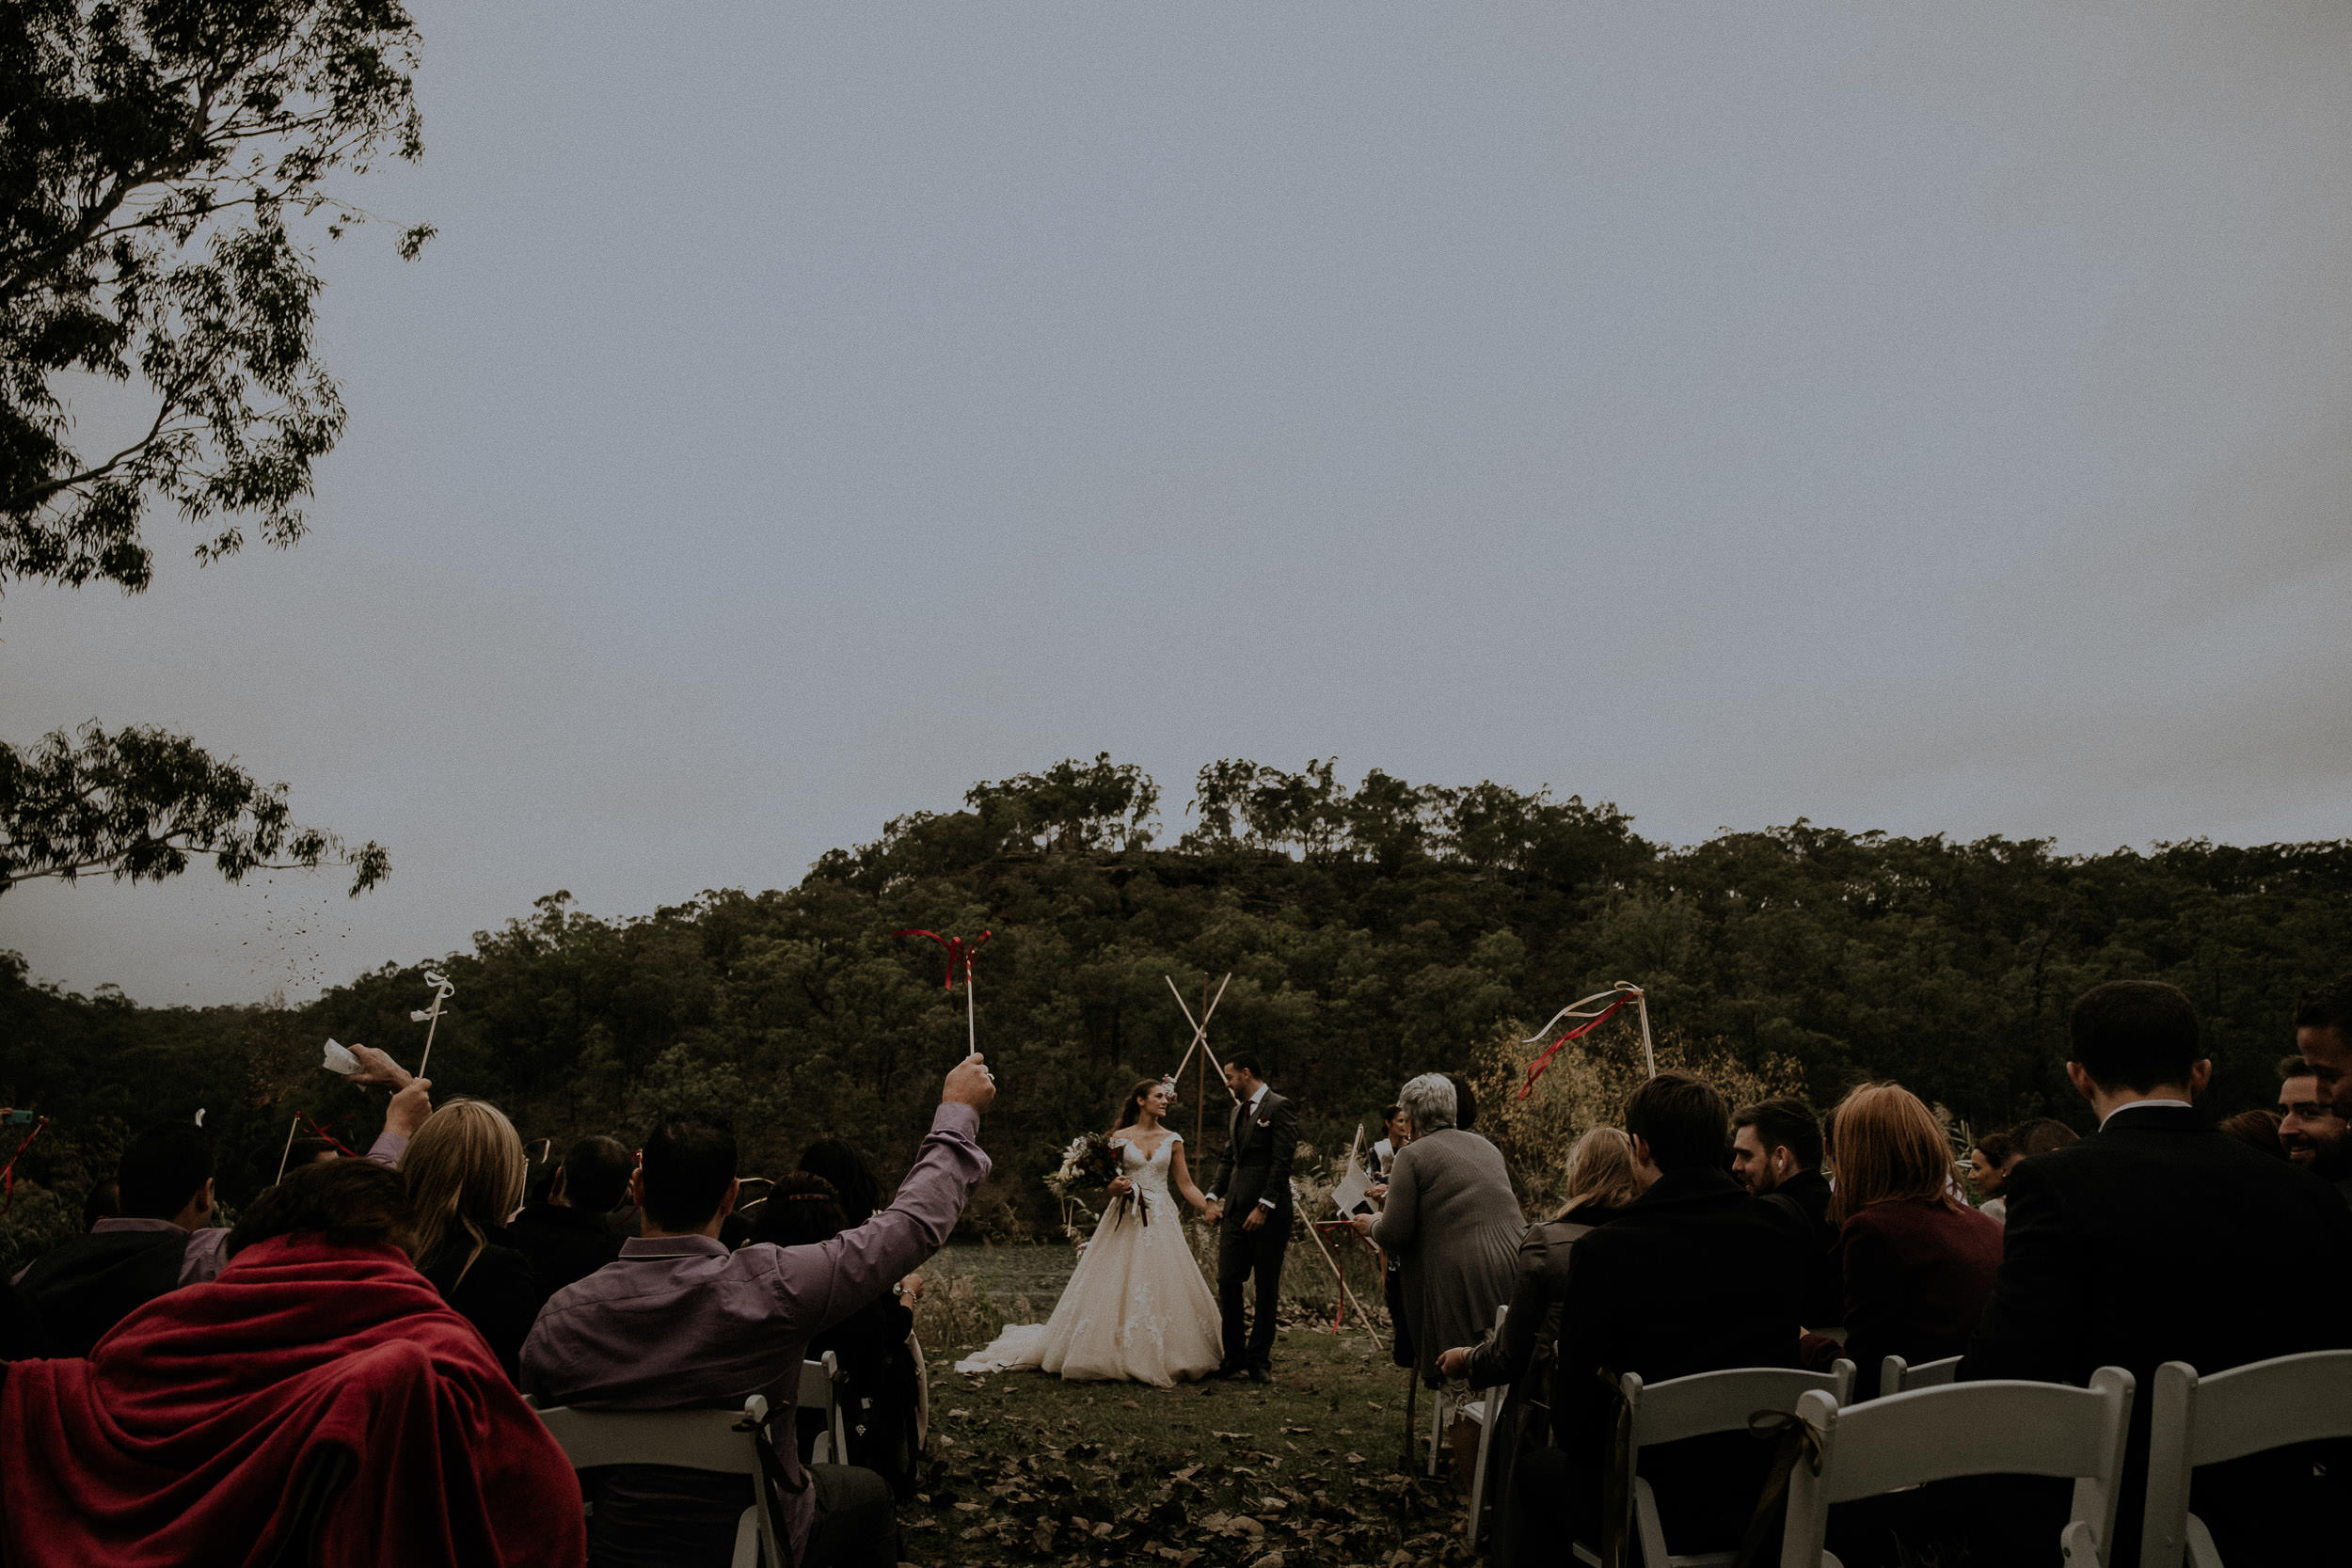 g_c wedding - kings _ thieves elopement wedding photography - blog 53.jpg